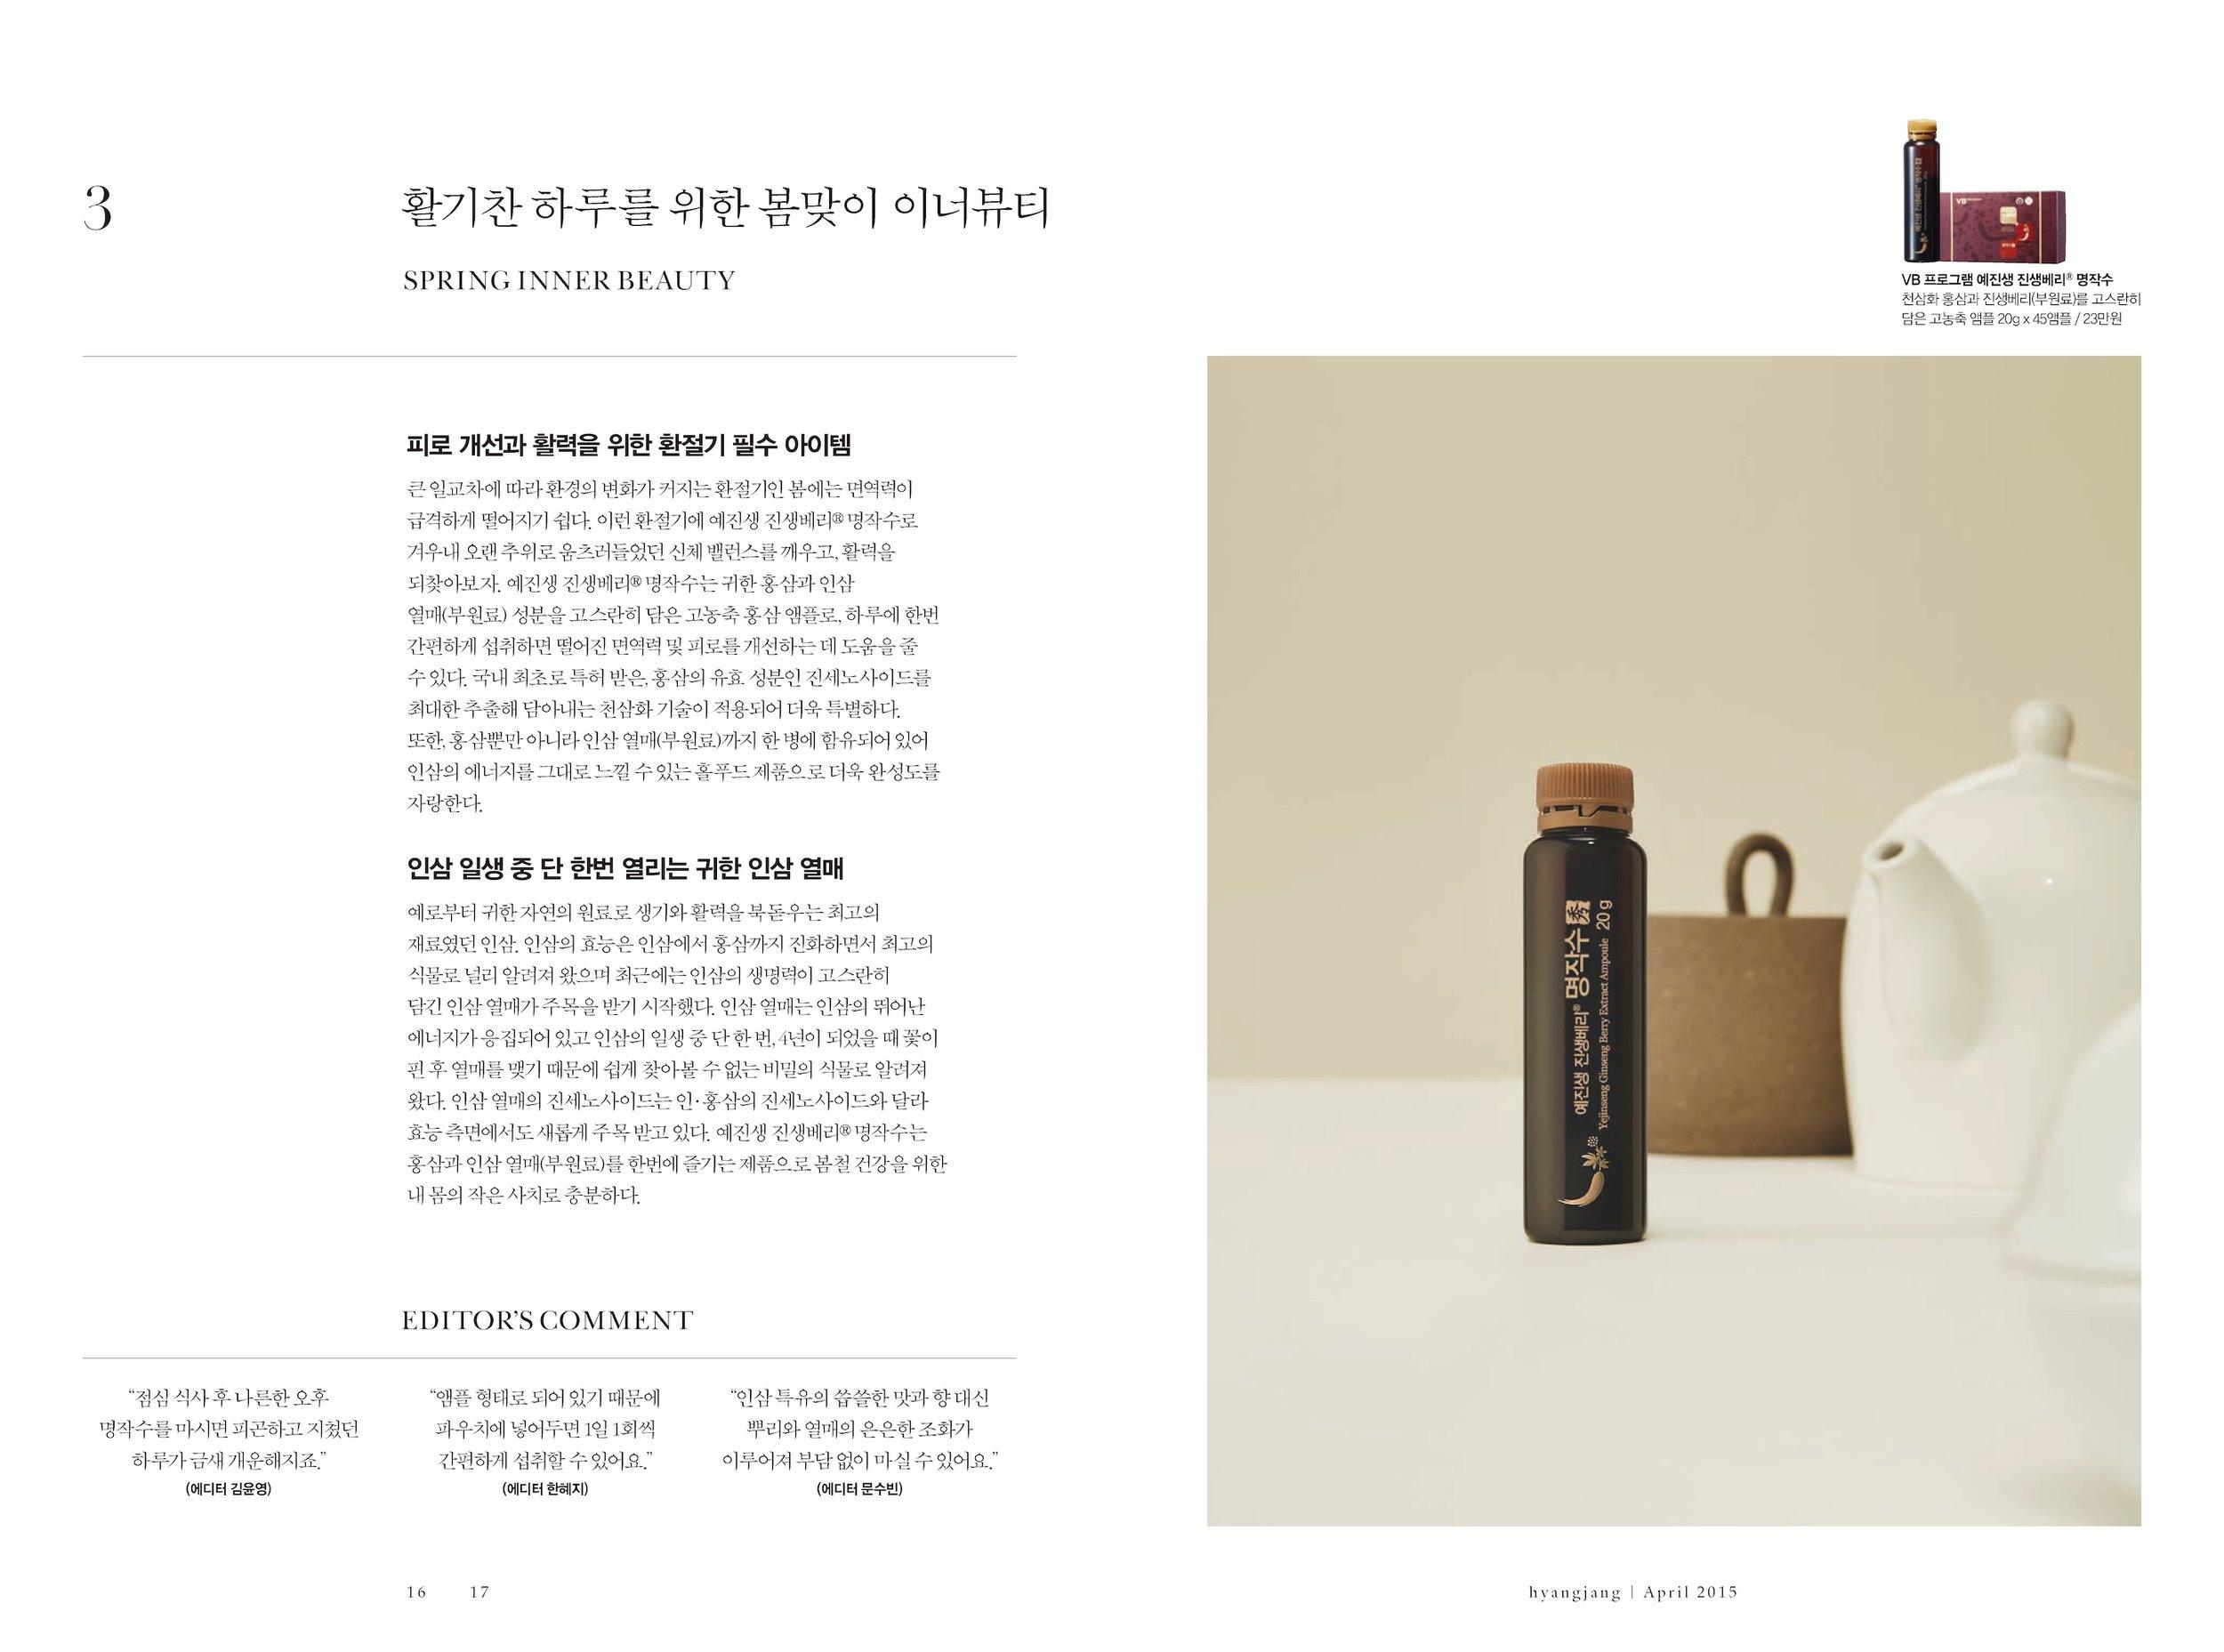 hyangjang-201504_페이지_09.jpeg